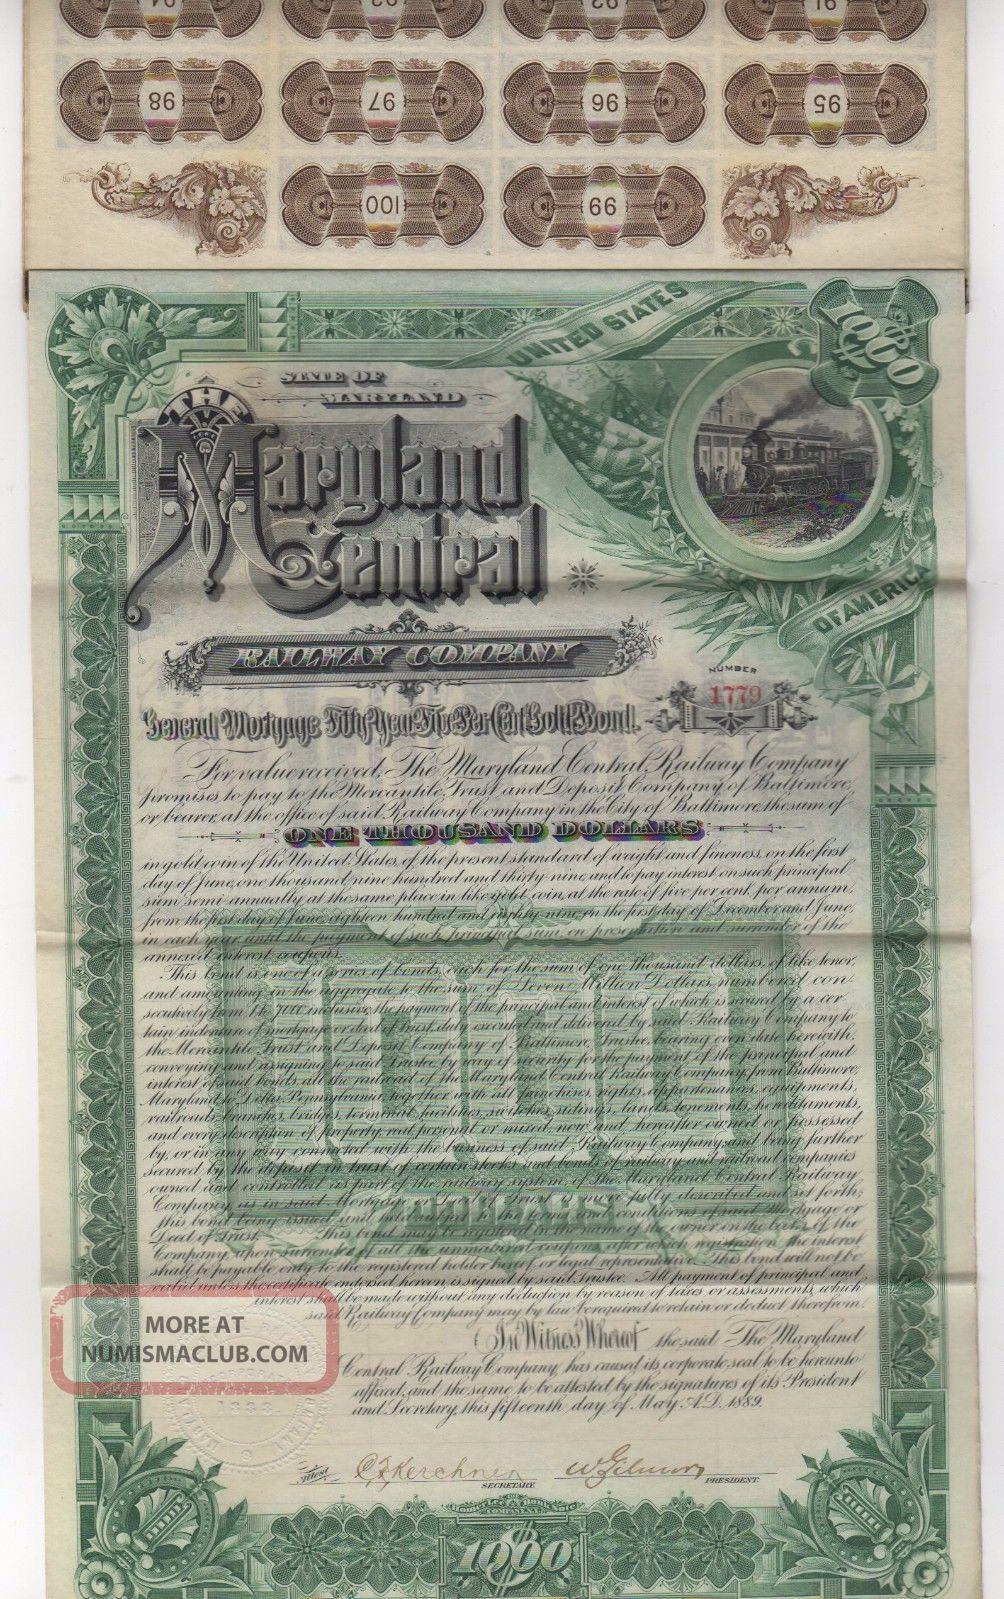 1889 Maryland Central Railway Co.  Bond W/bond Coupons Transportation photo